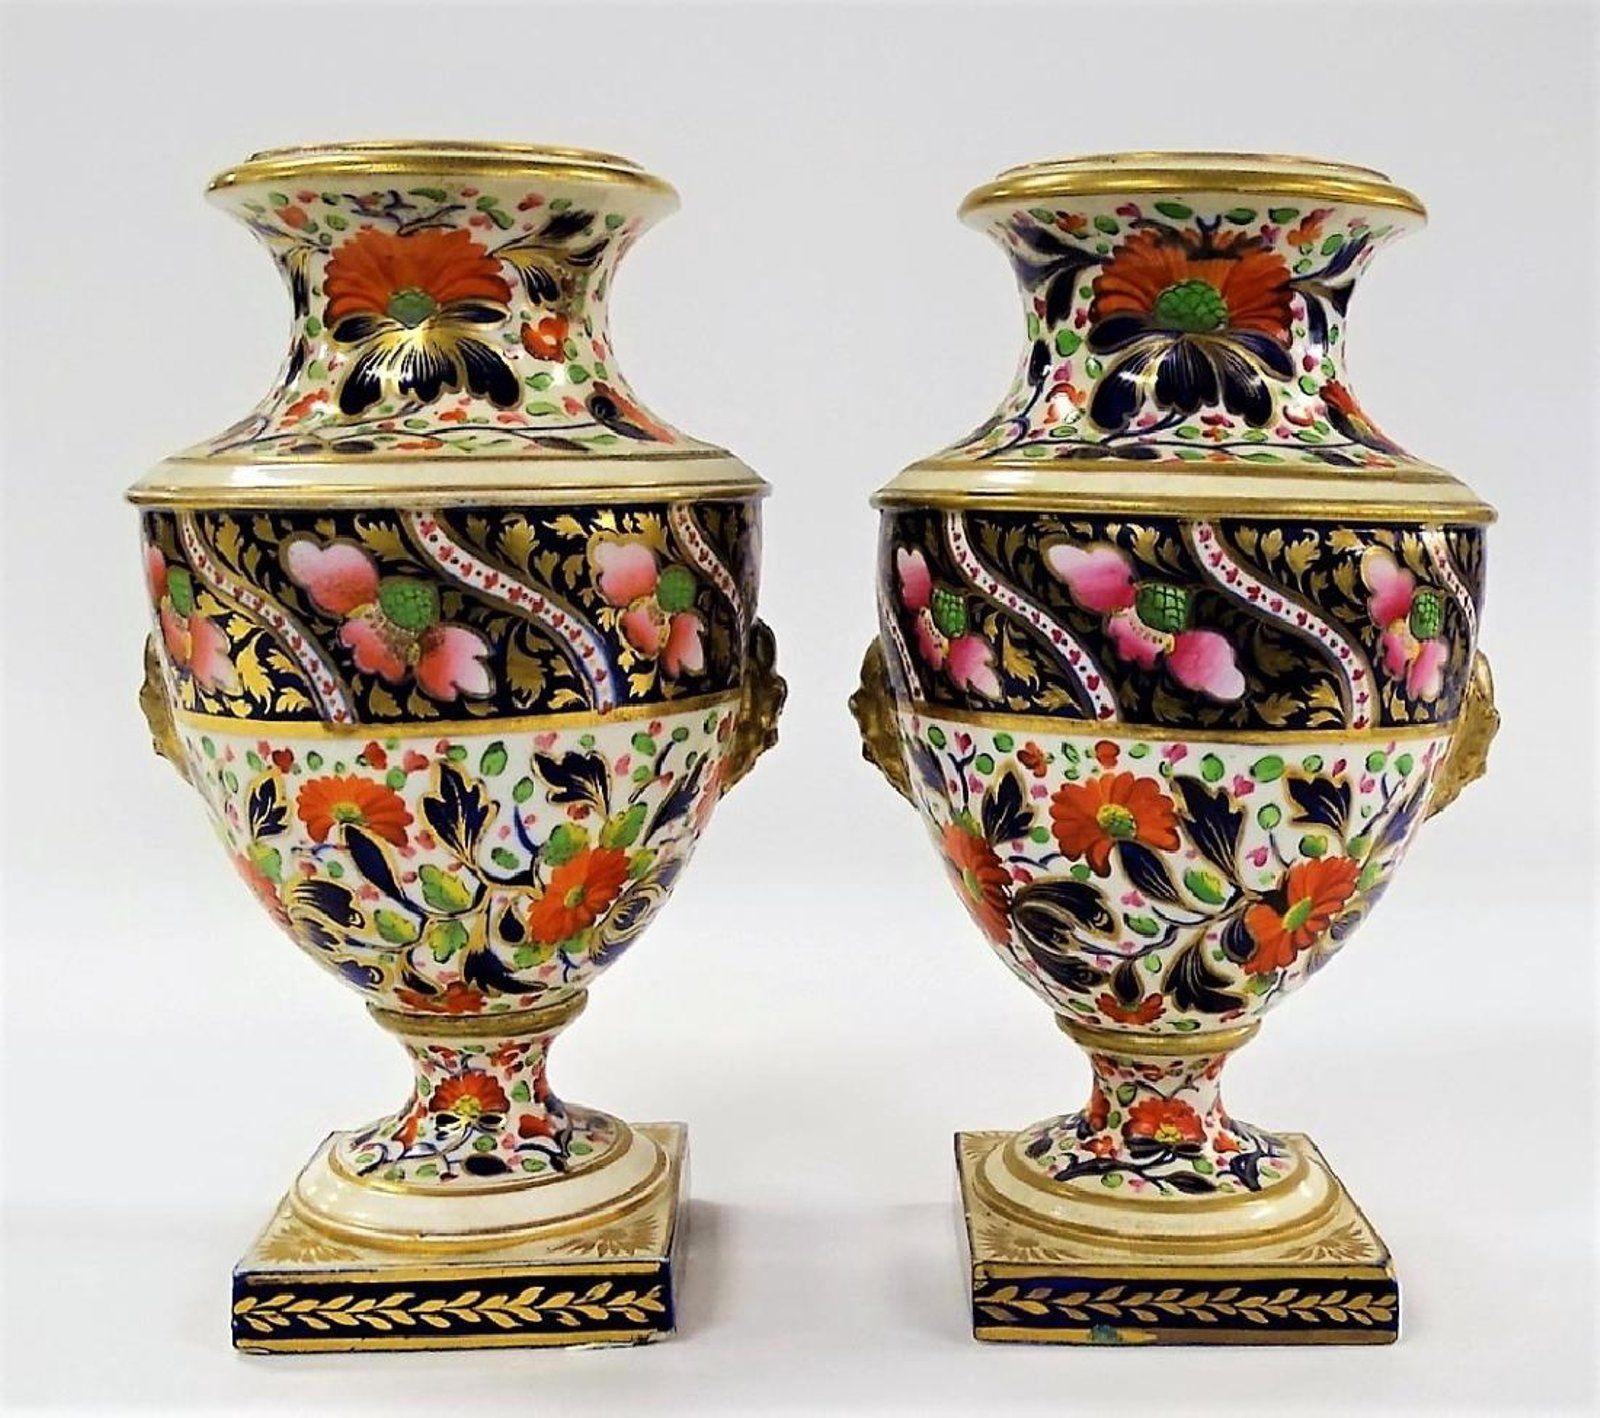 Pr early 19th c royal crown derby porcelain vases portelan pr early 19th c royal crown derby porcelain vases reviewsmspy